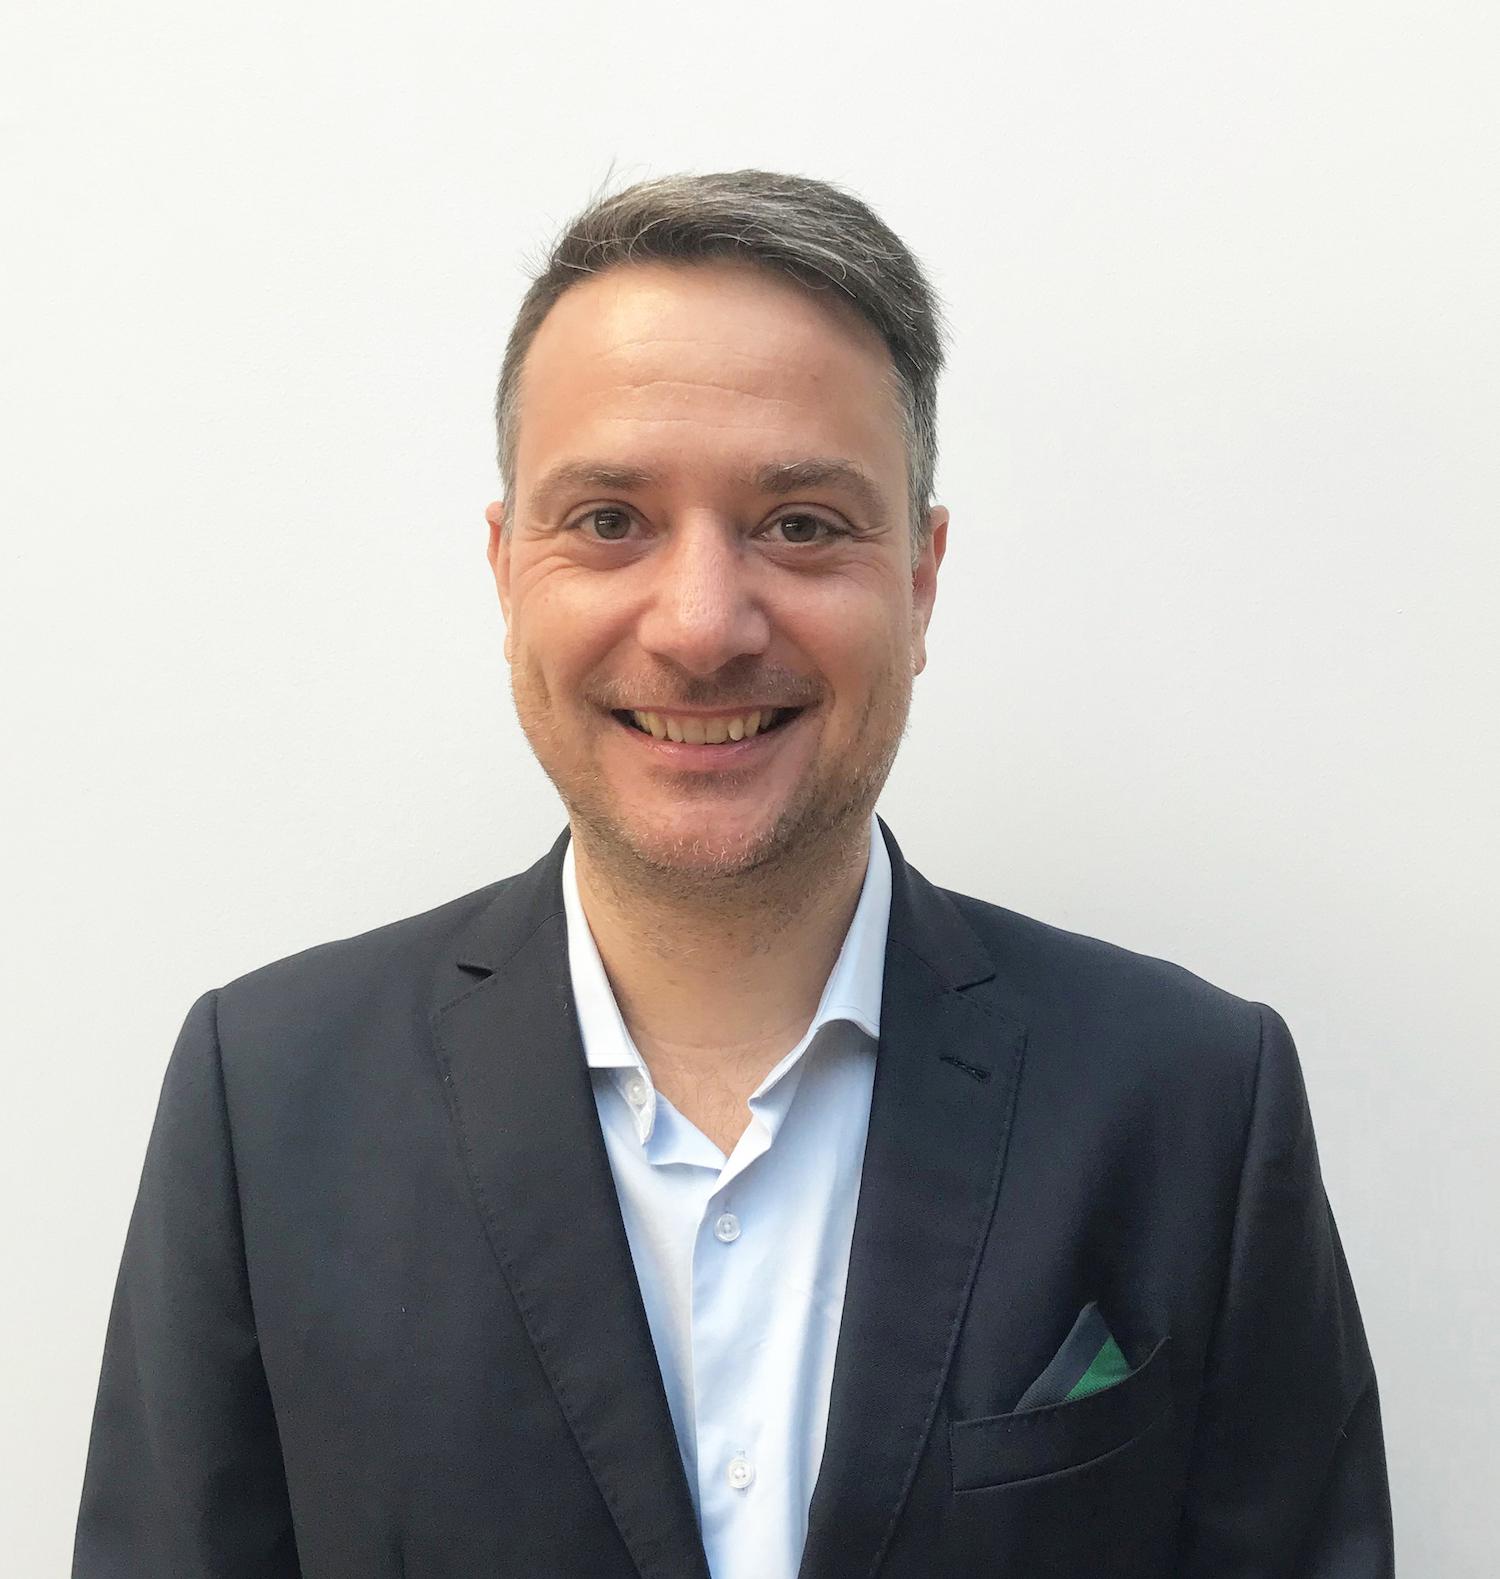 Fredrik Tegberg General Manager Sales Getinge Sverige AB